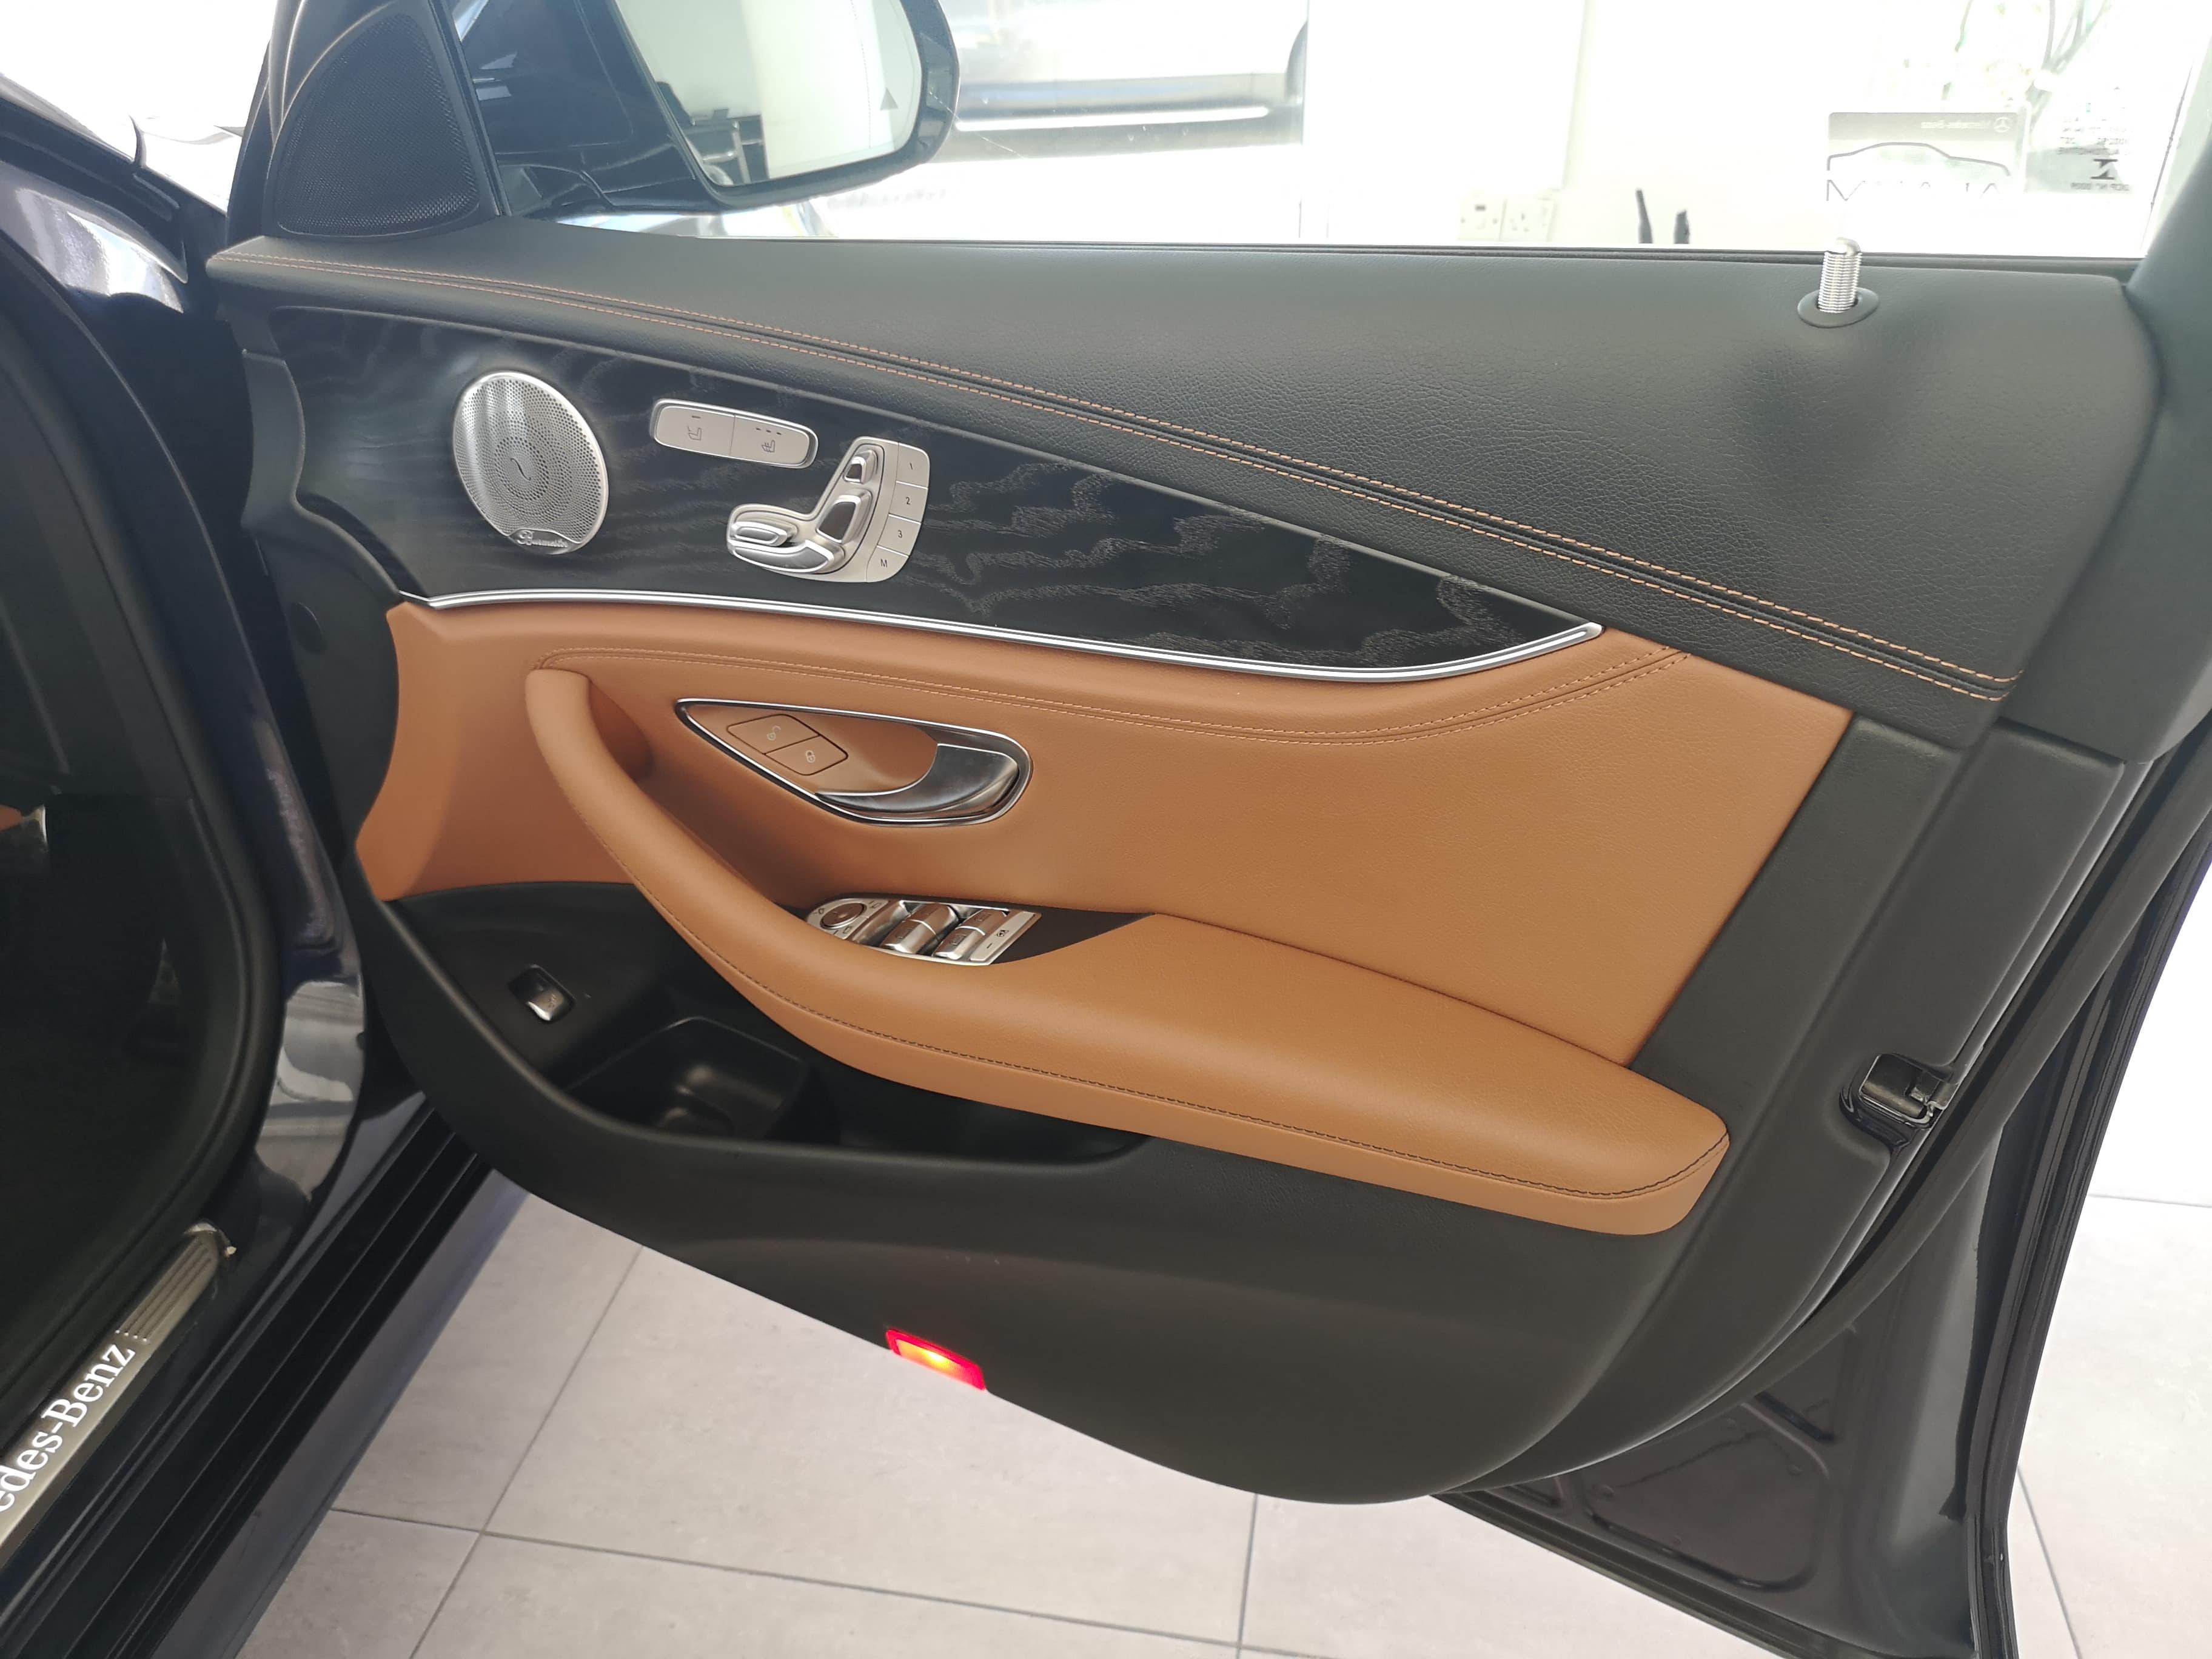 Mercedes-Benz E Class 2019 E 400 D 4Matic AMG Line PREMIUM PLUS